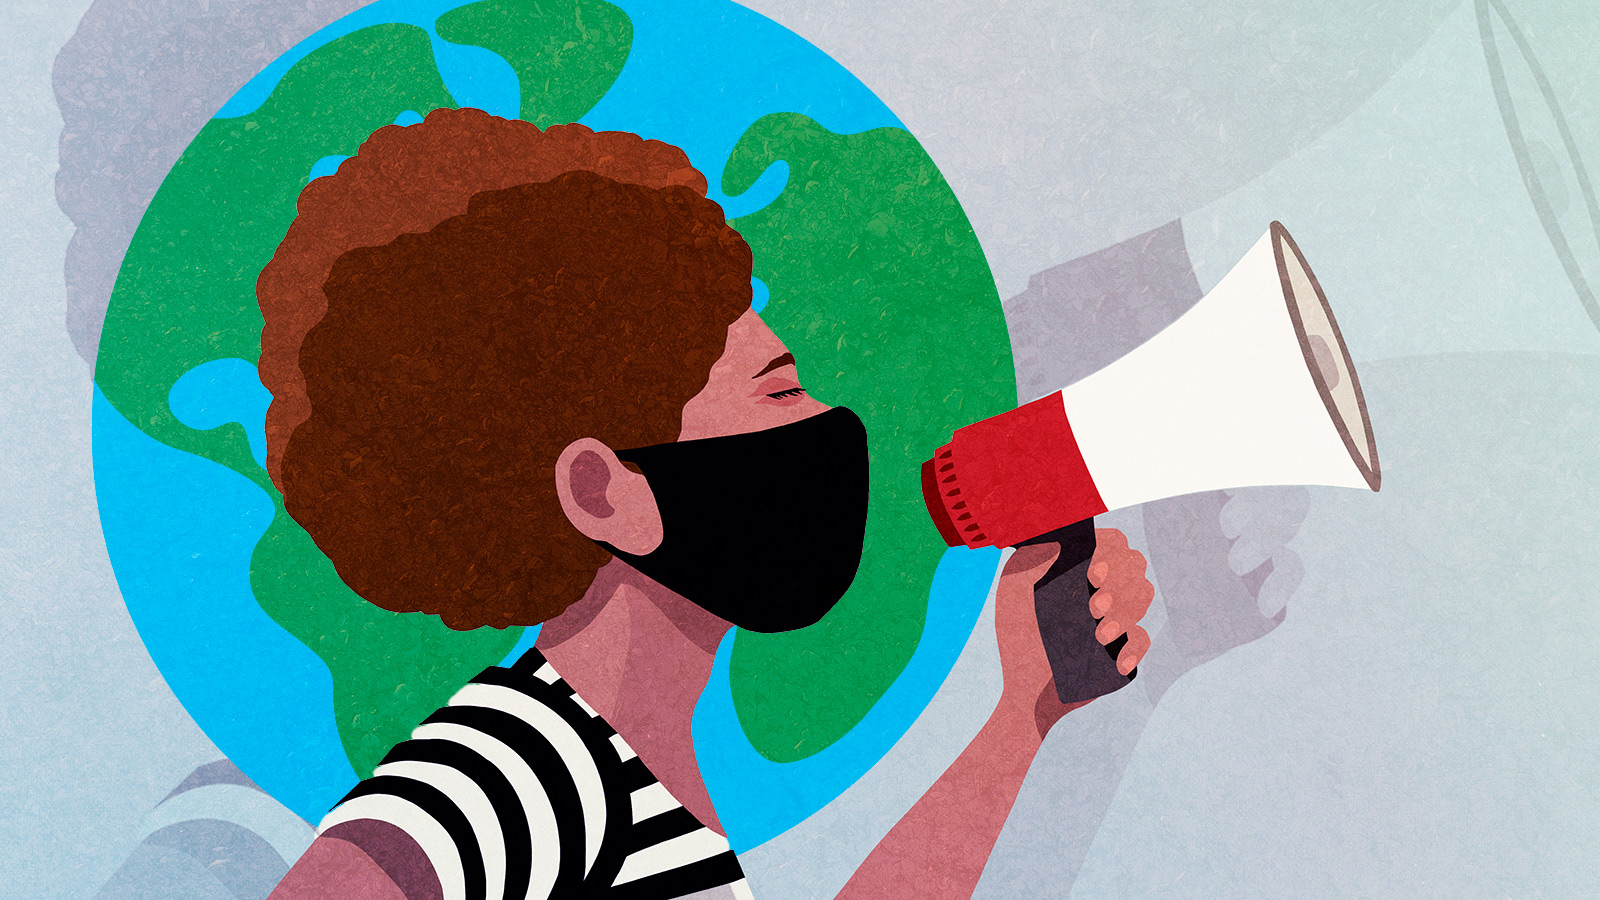 Illustrated female activist with megaphone